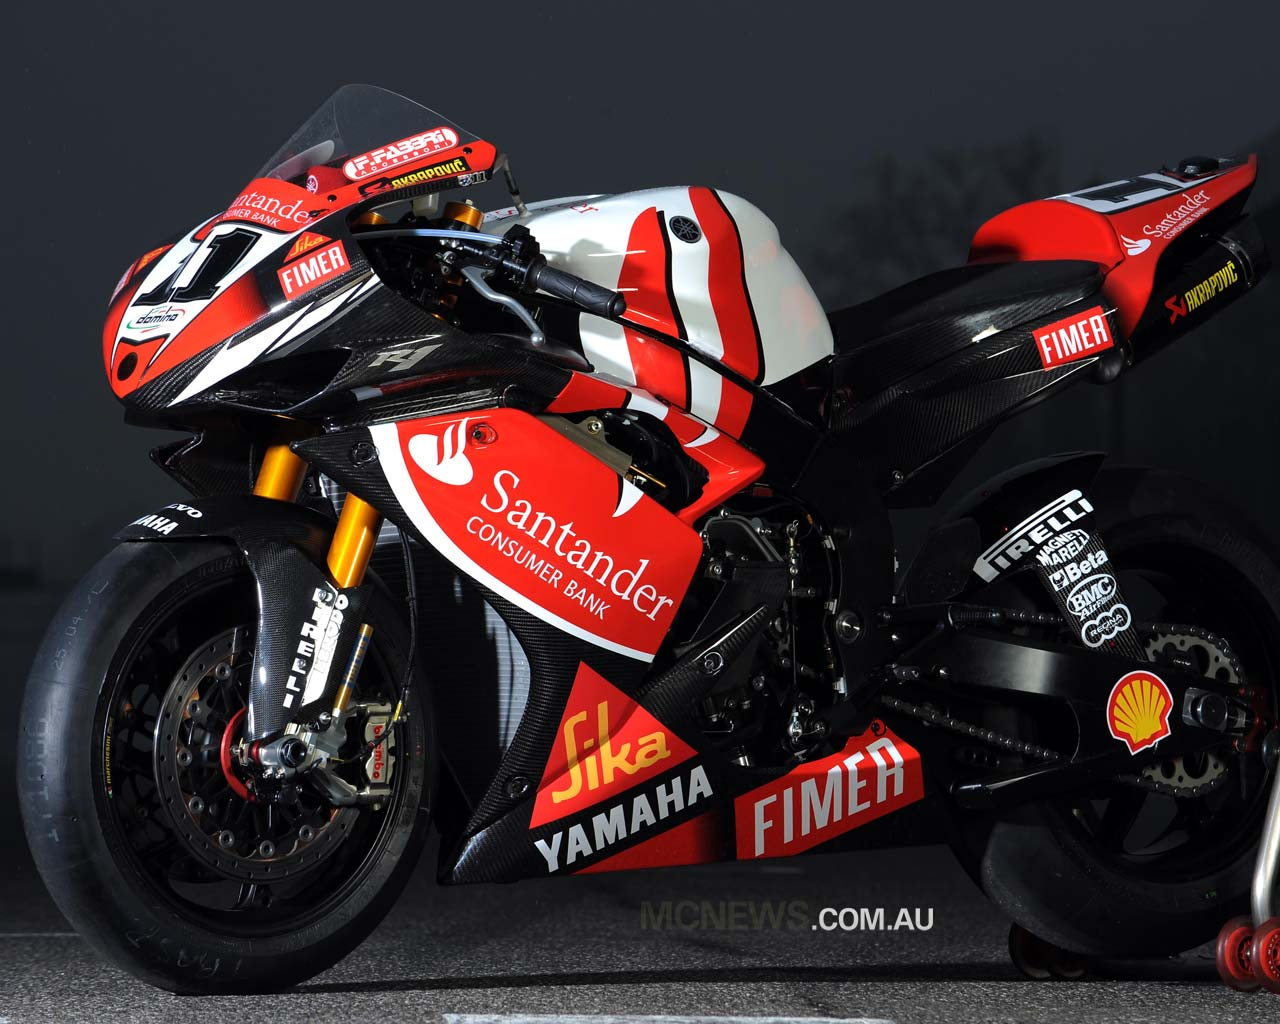 Yamaha R1 SuperBike Wallpapers | Super & Heavy Bikes